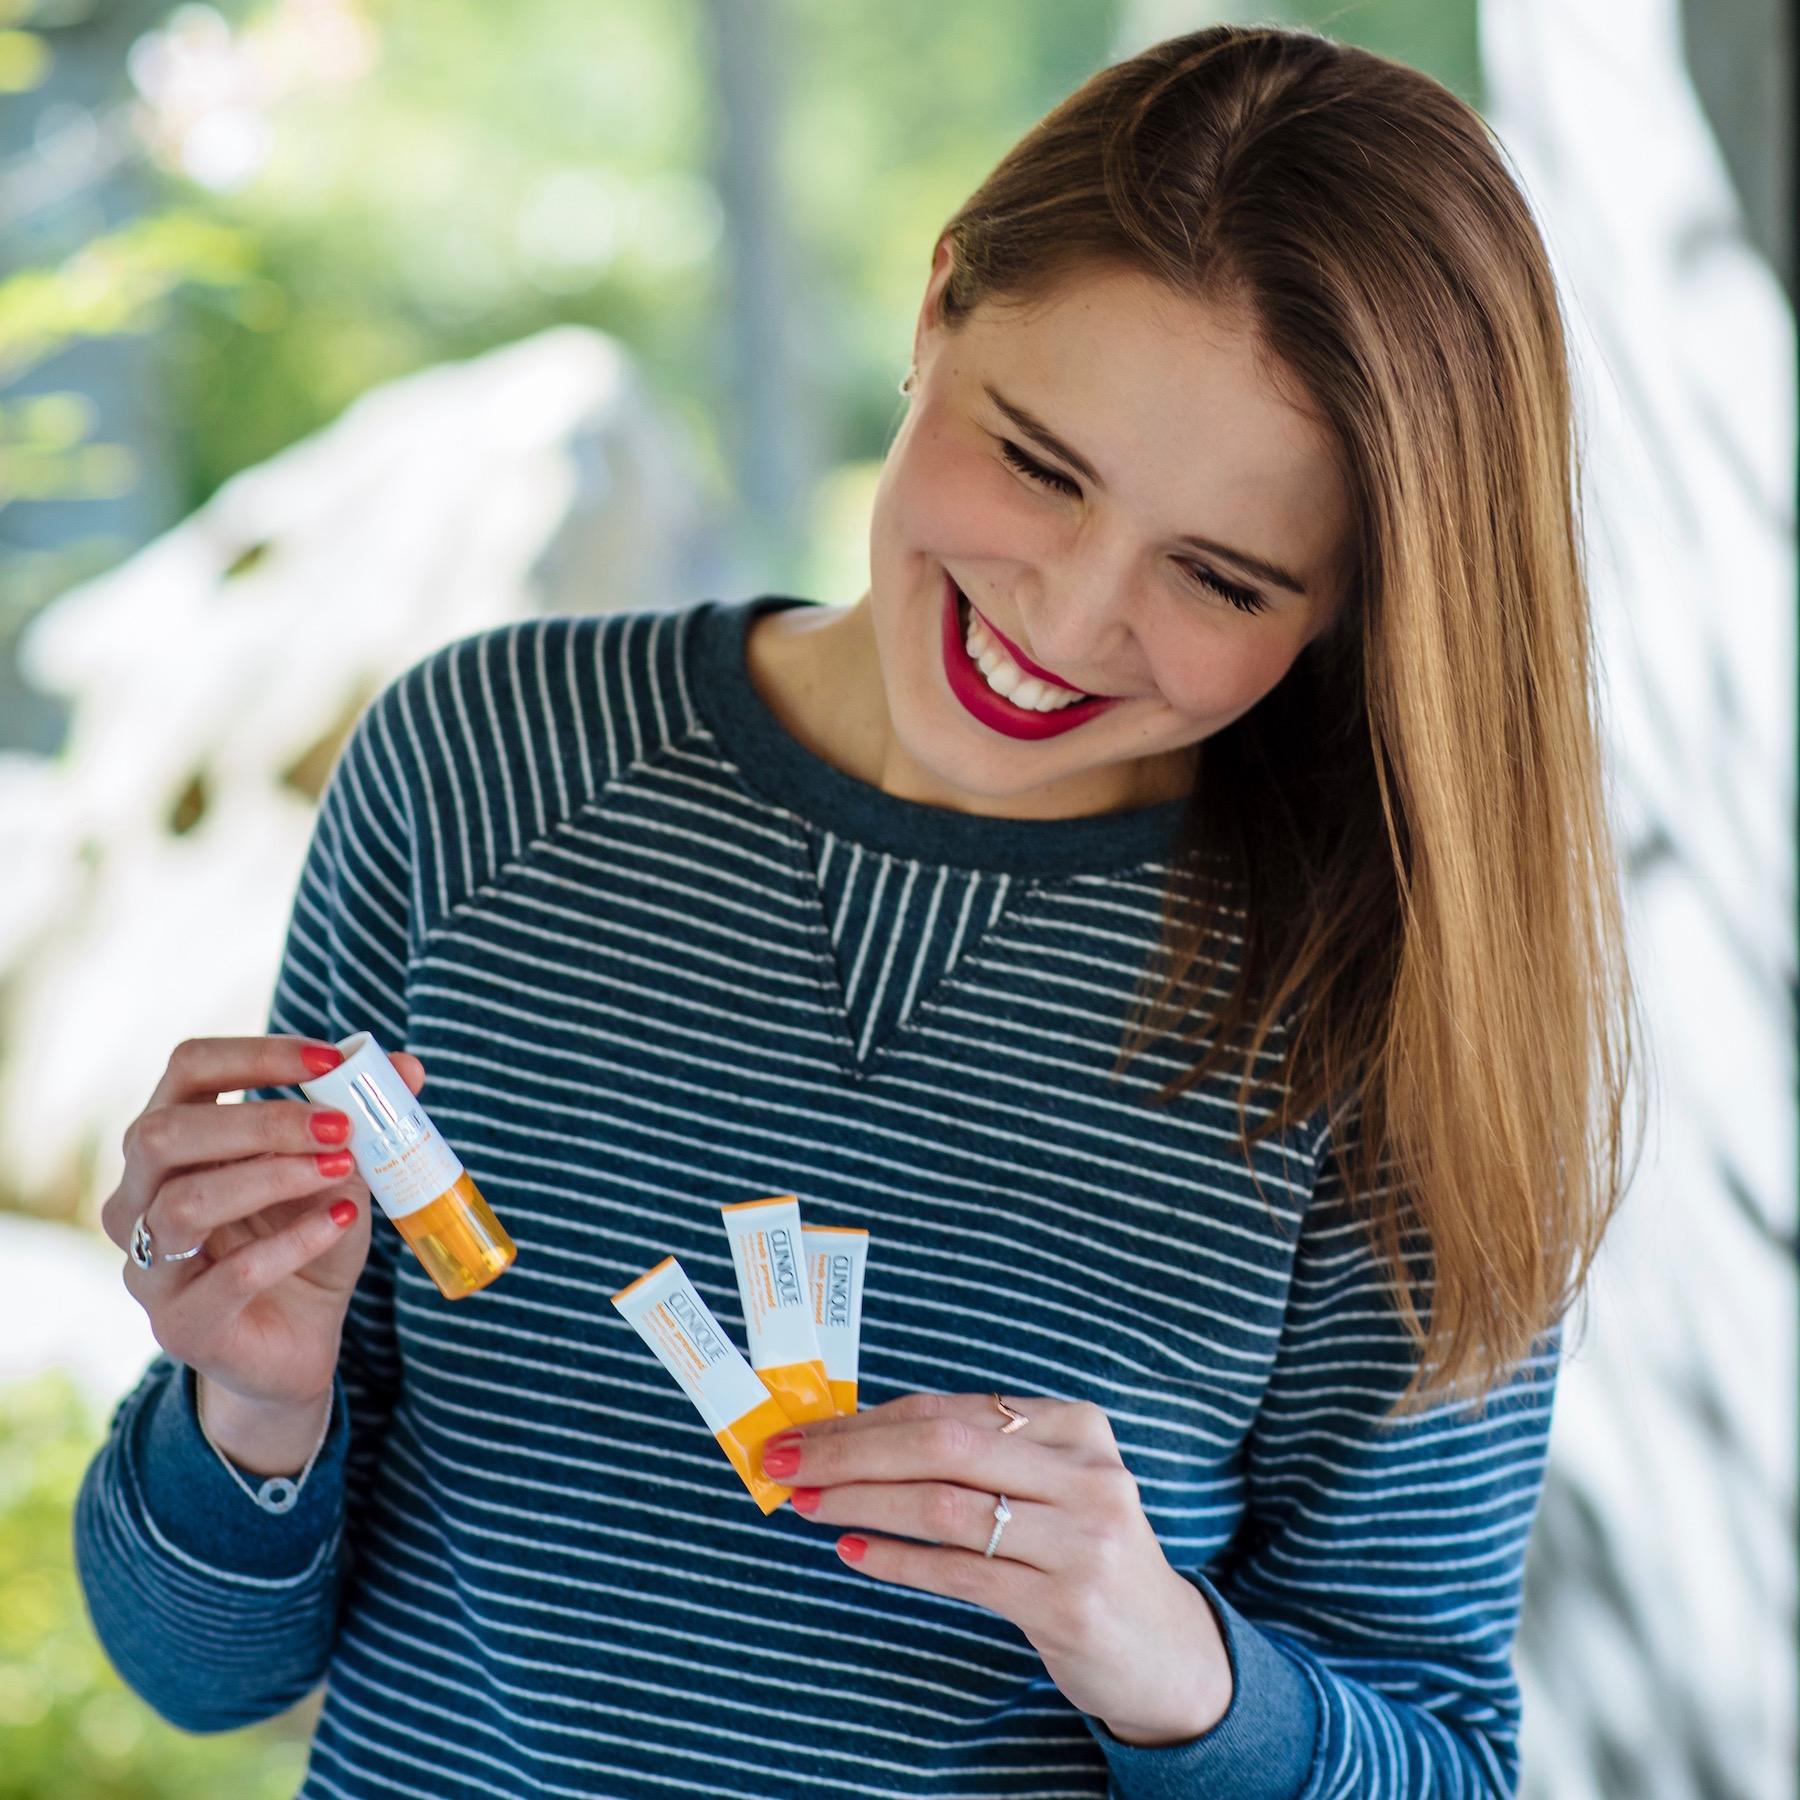 clinique fresh pressed vitamin c für die haut suelovesnyc_susan_fengler_blog_beauty_clinique_fresh_pressed_fazit_test_daily_booster